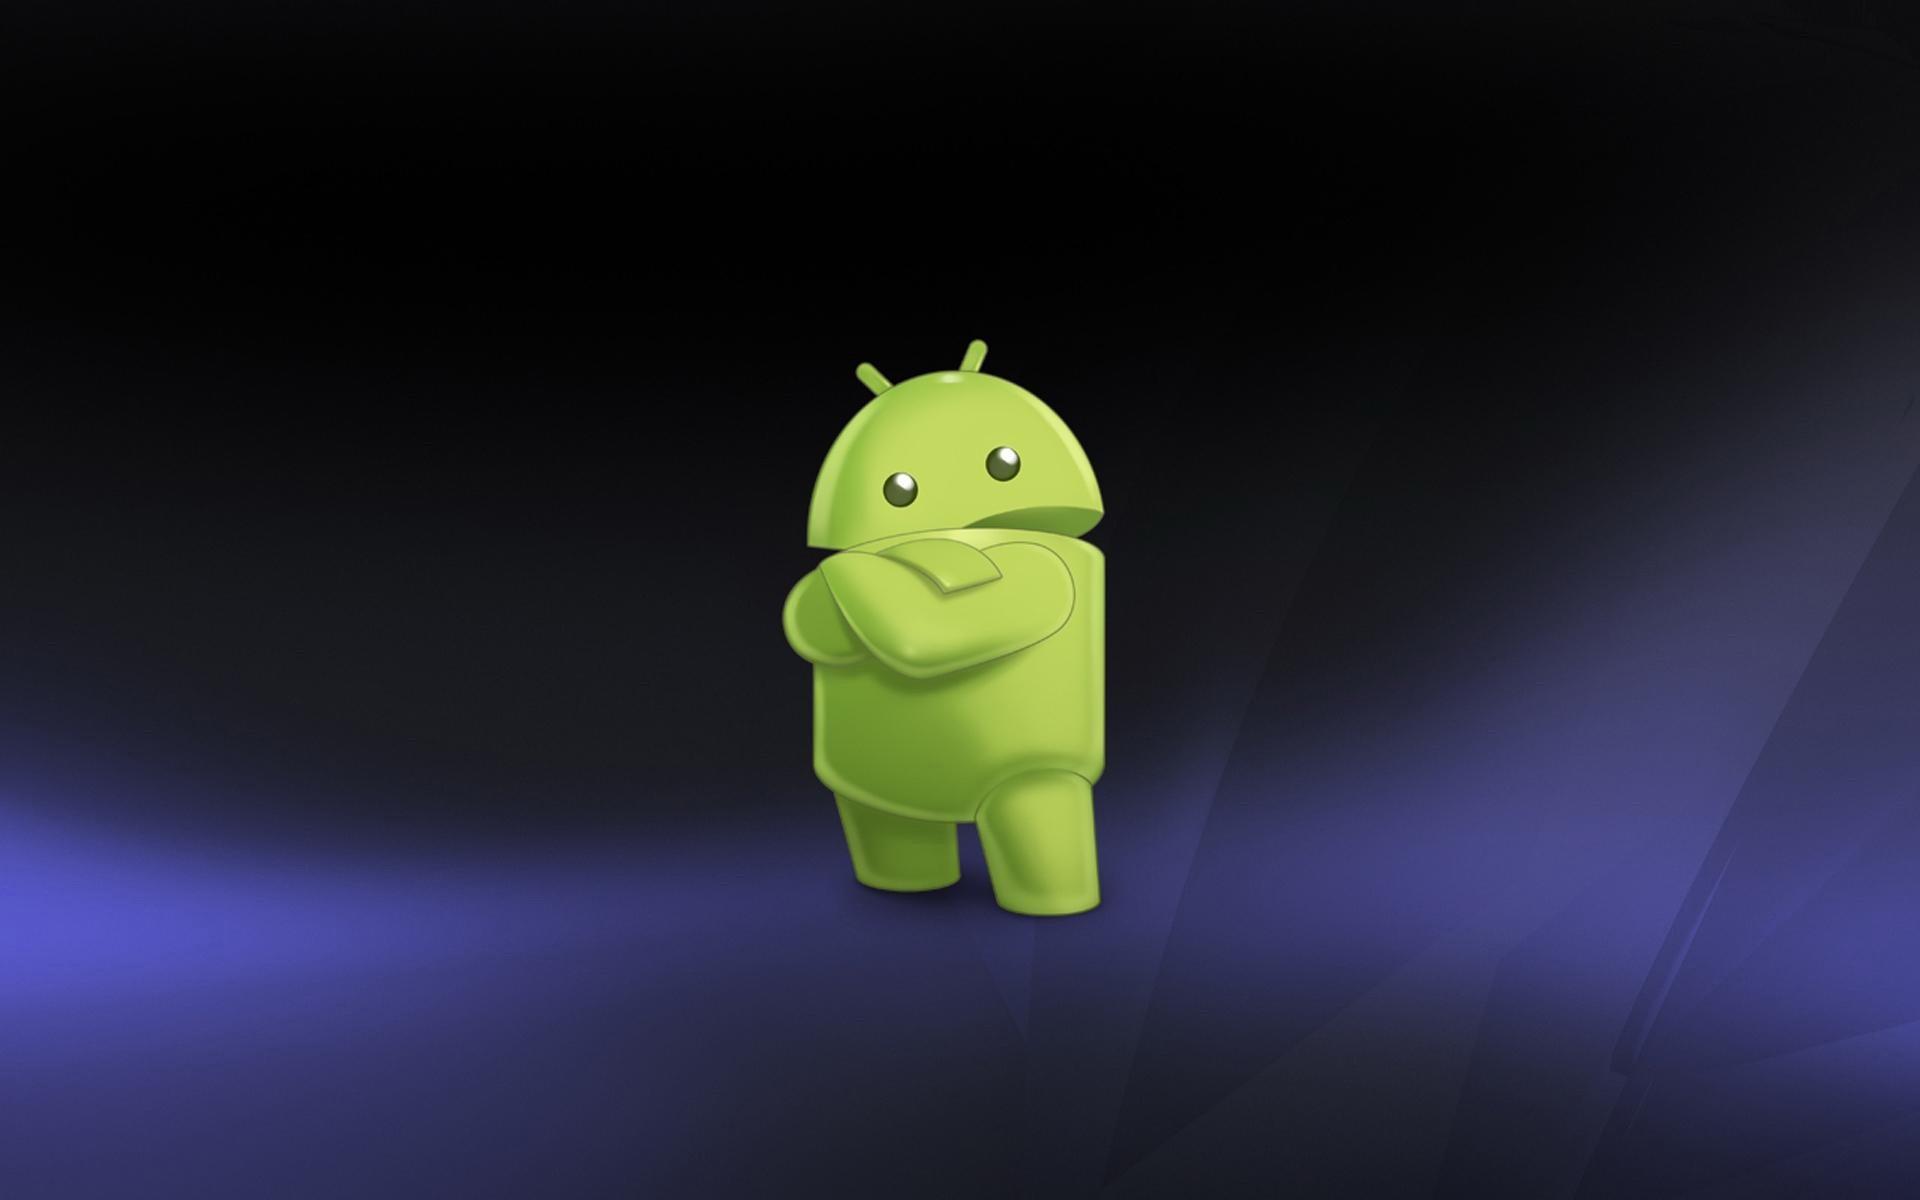 Картинки крутые на телефон андроид